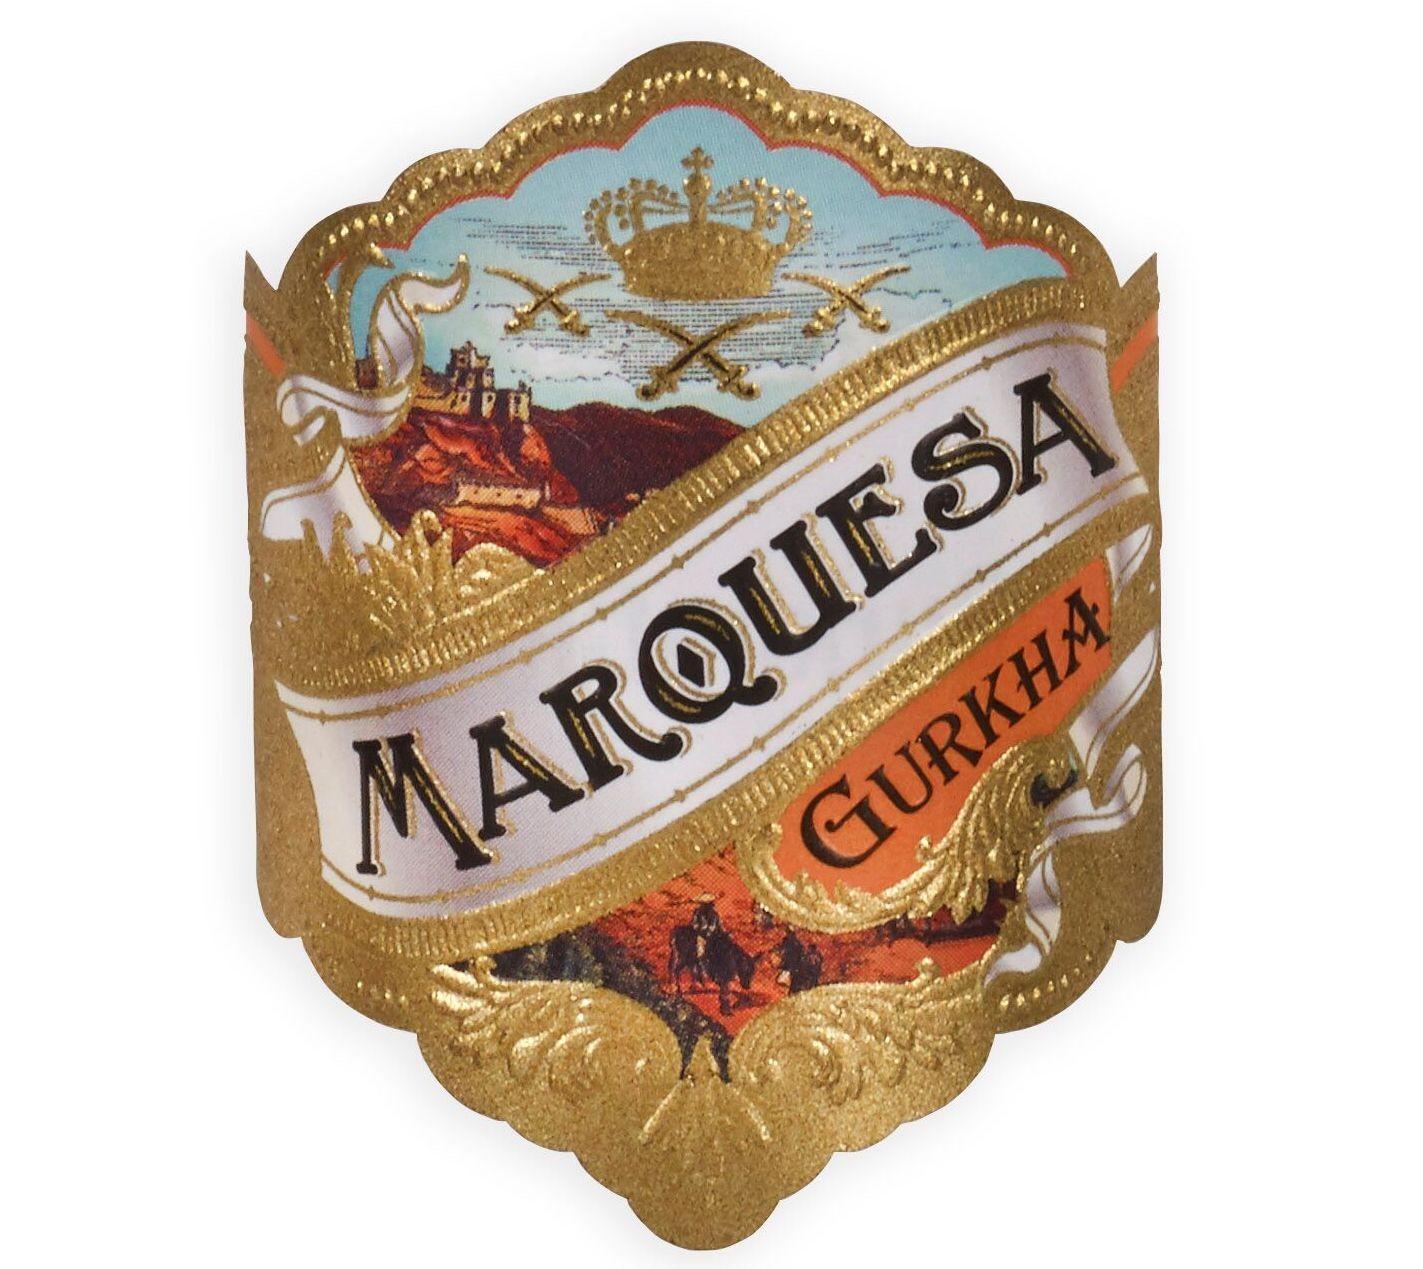 Little Havana Cigar Factory - Gurkha Marquesa Robusto Cigars